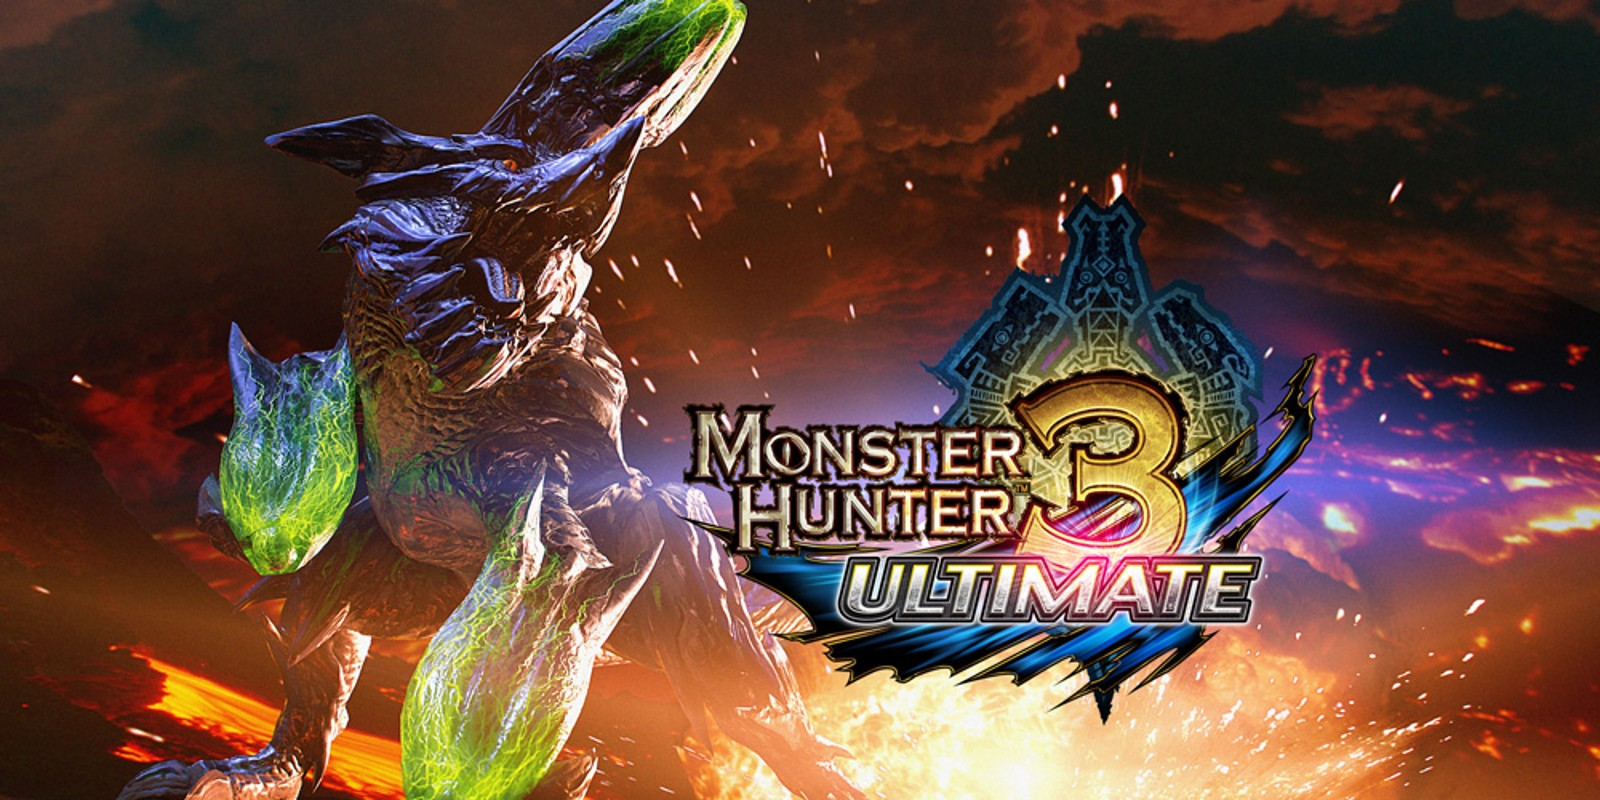 Mario 3d Wallpaper Monster Hunter 3 Ultimate Nintendo 3ds Games Nintendo